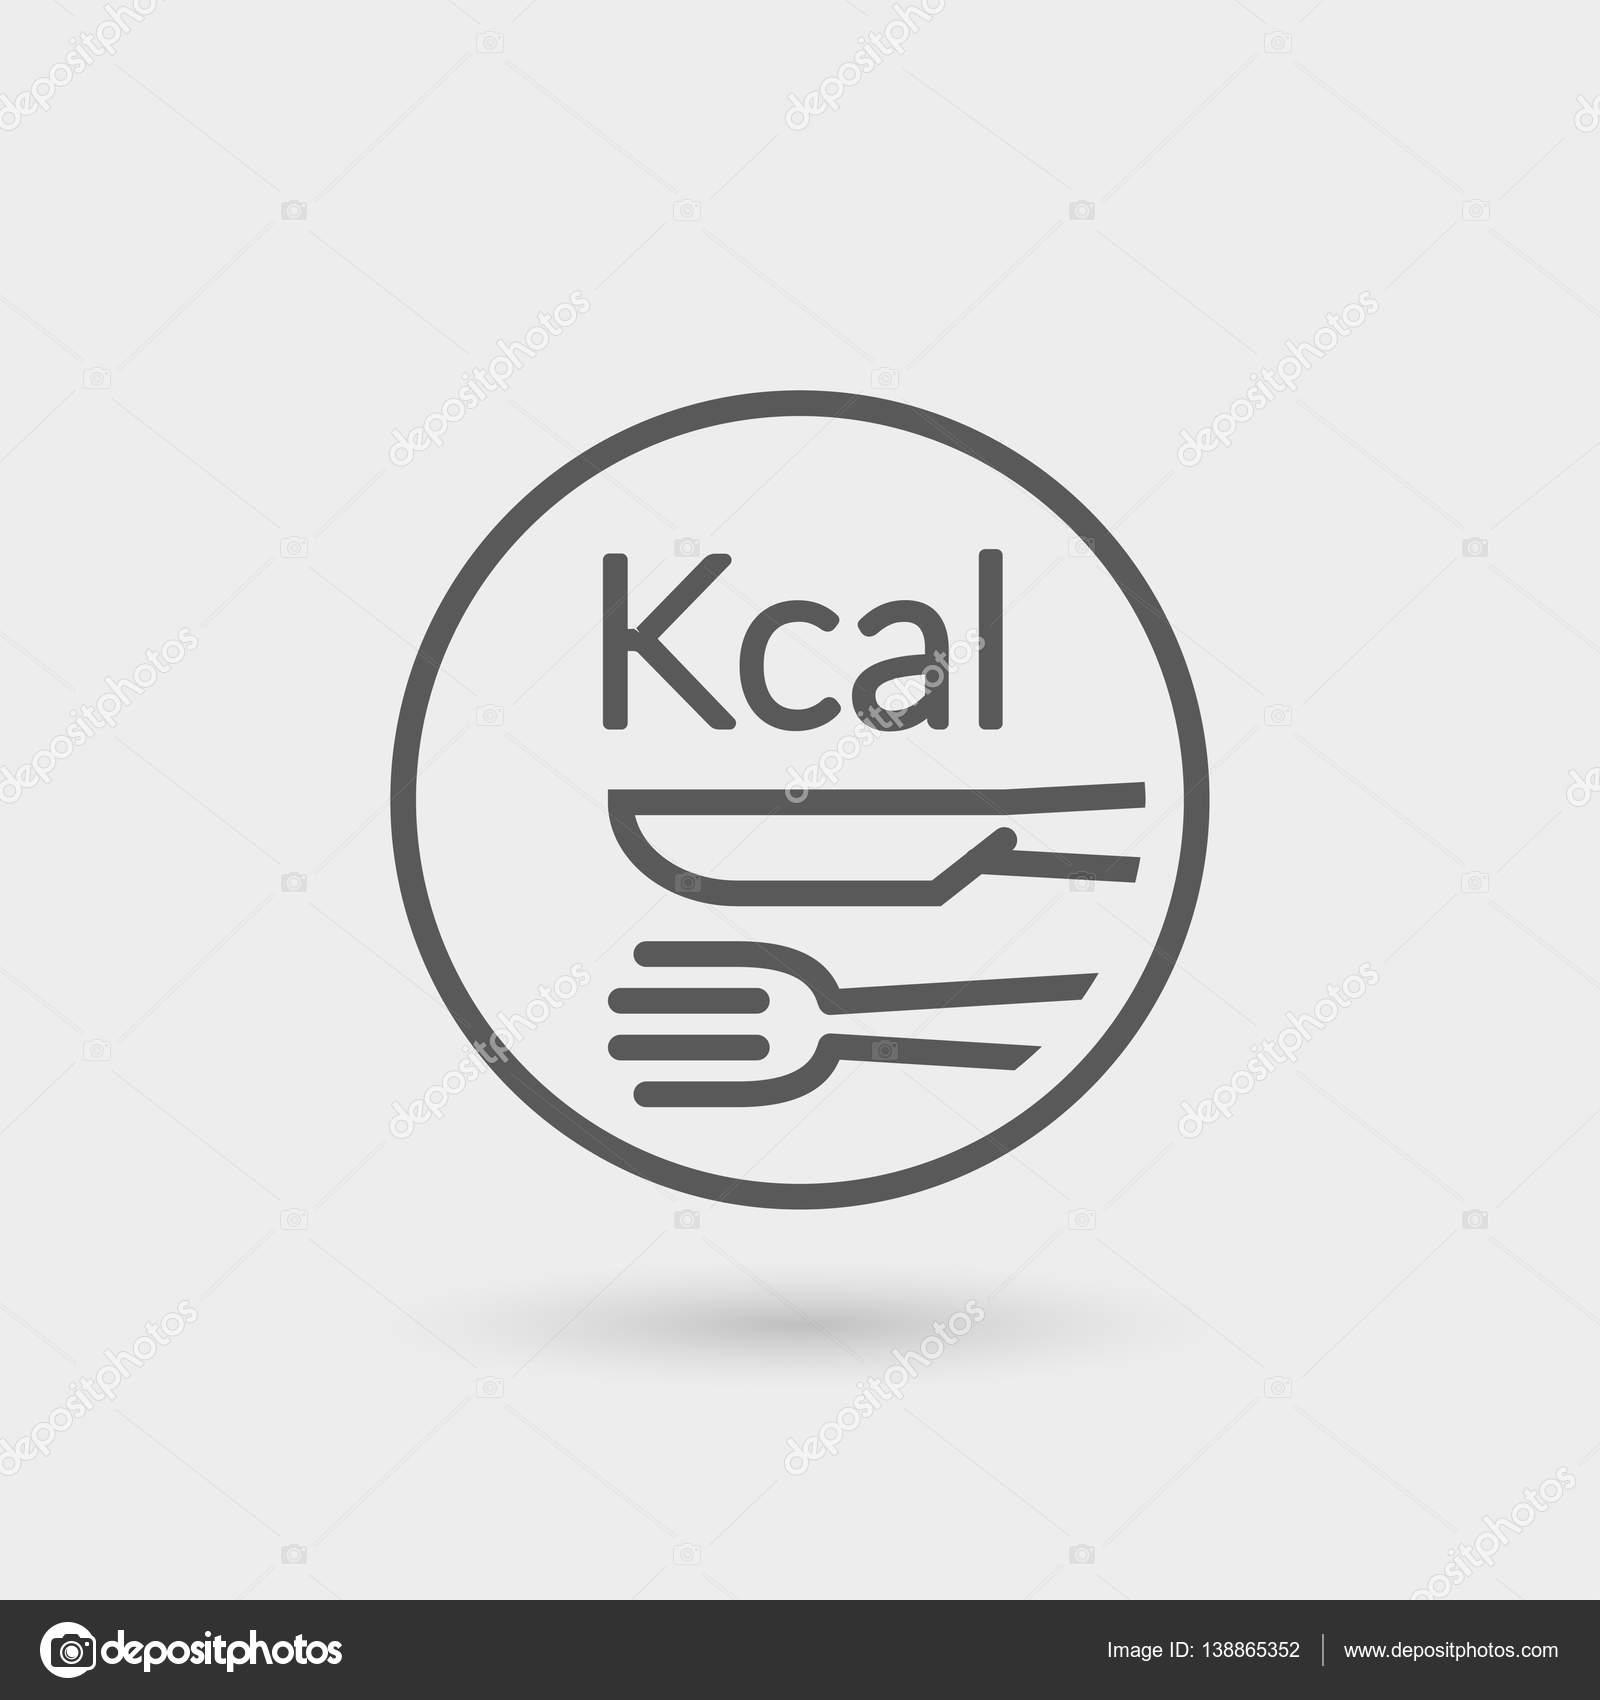 kcal thin line icon  Stock Vector  art_co 138865352